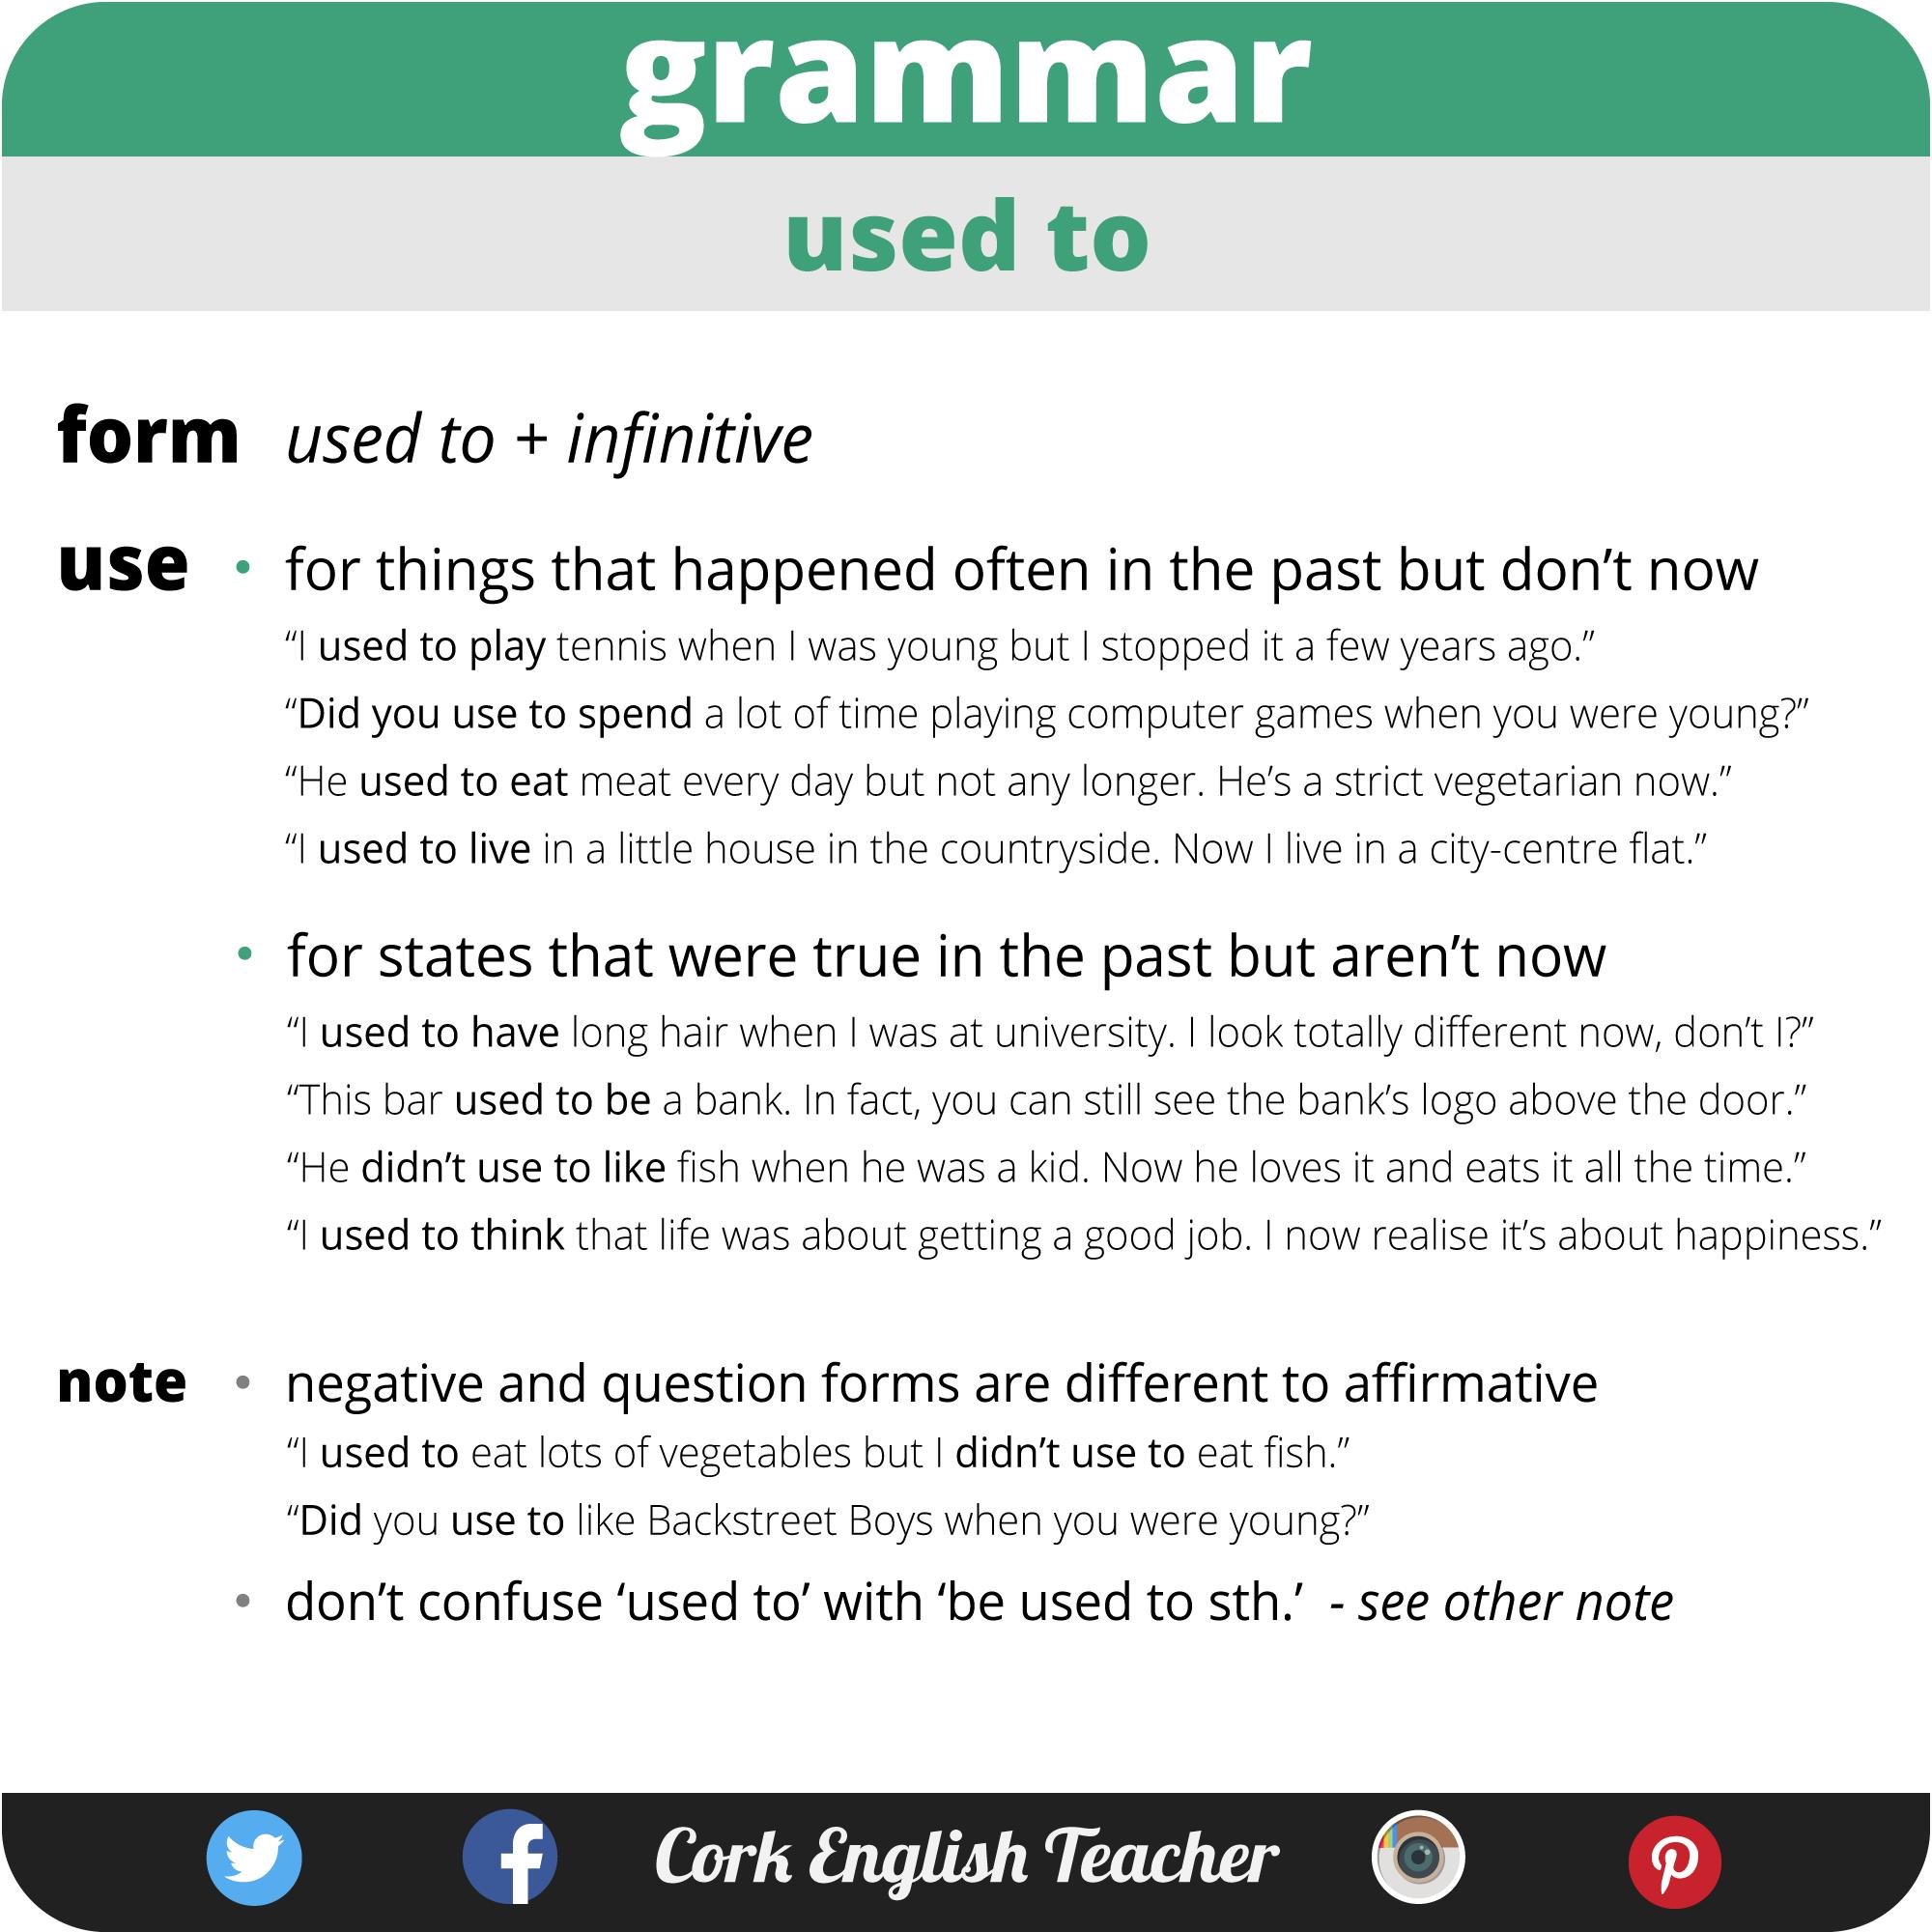 Worksheets Ged Grammar Worksheets mejorando mi ingles english class pinterest grammar worksheets